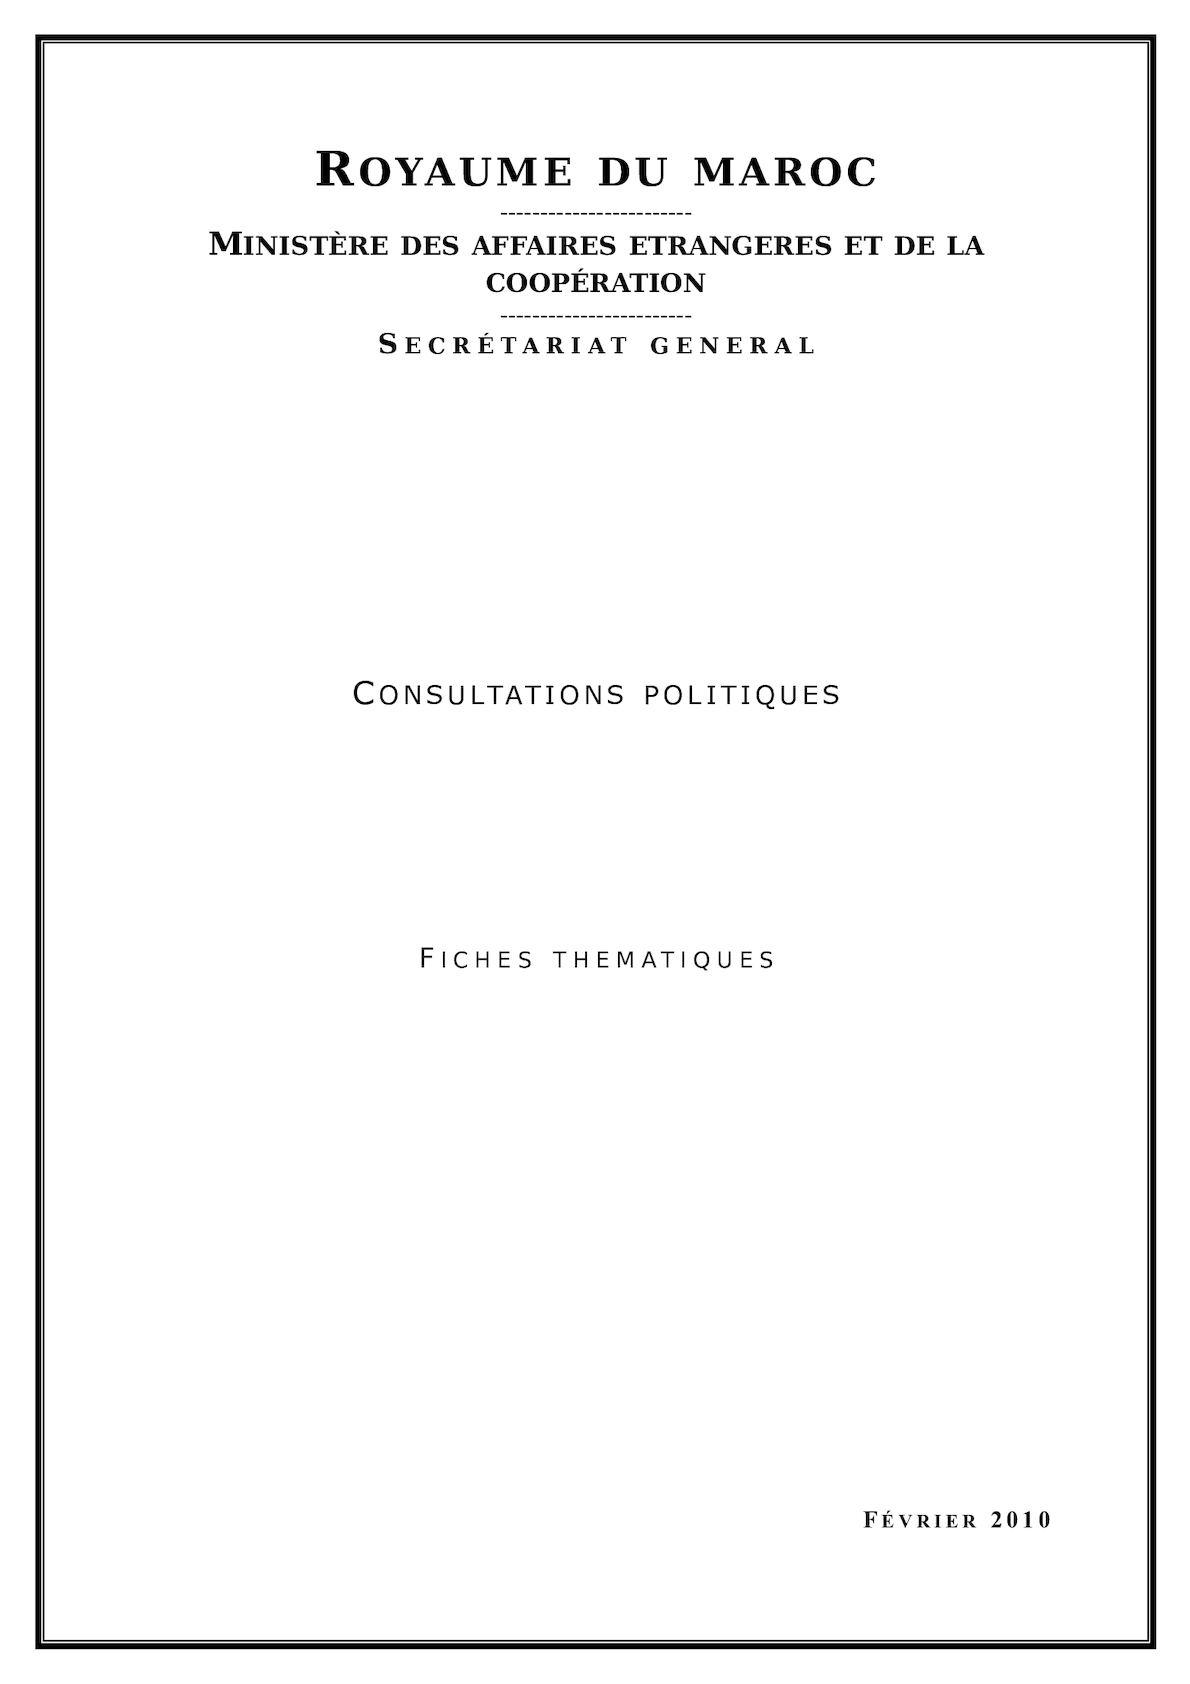 Sg Maec Fiches Des Consultations Politiques 2010 26 2 2010 Vf 1